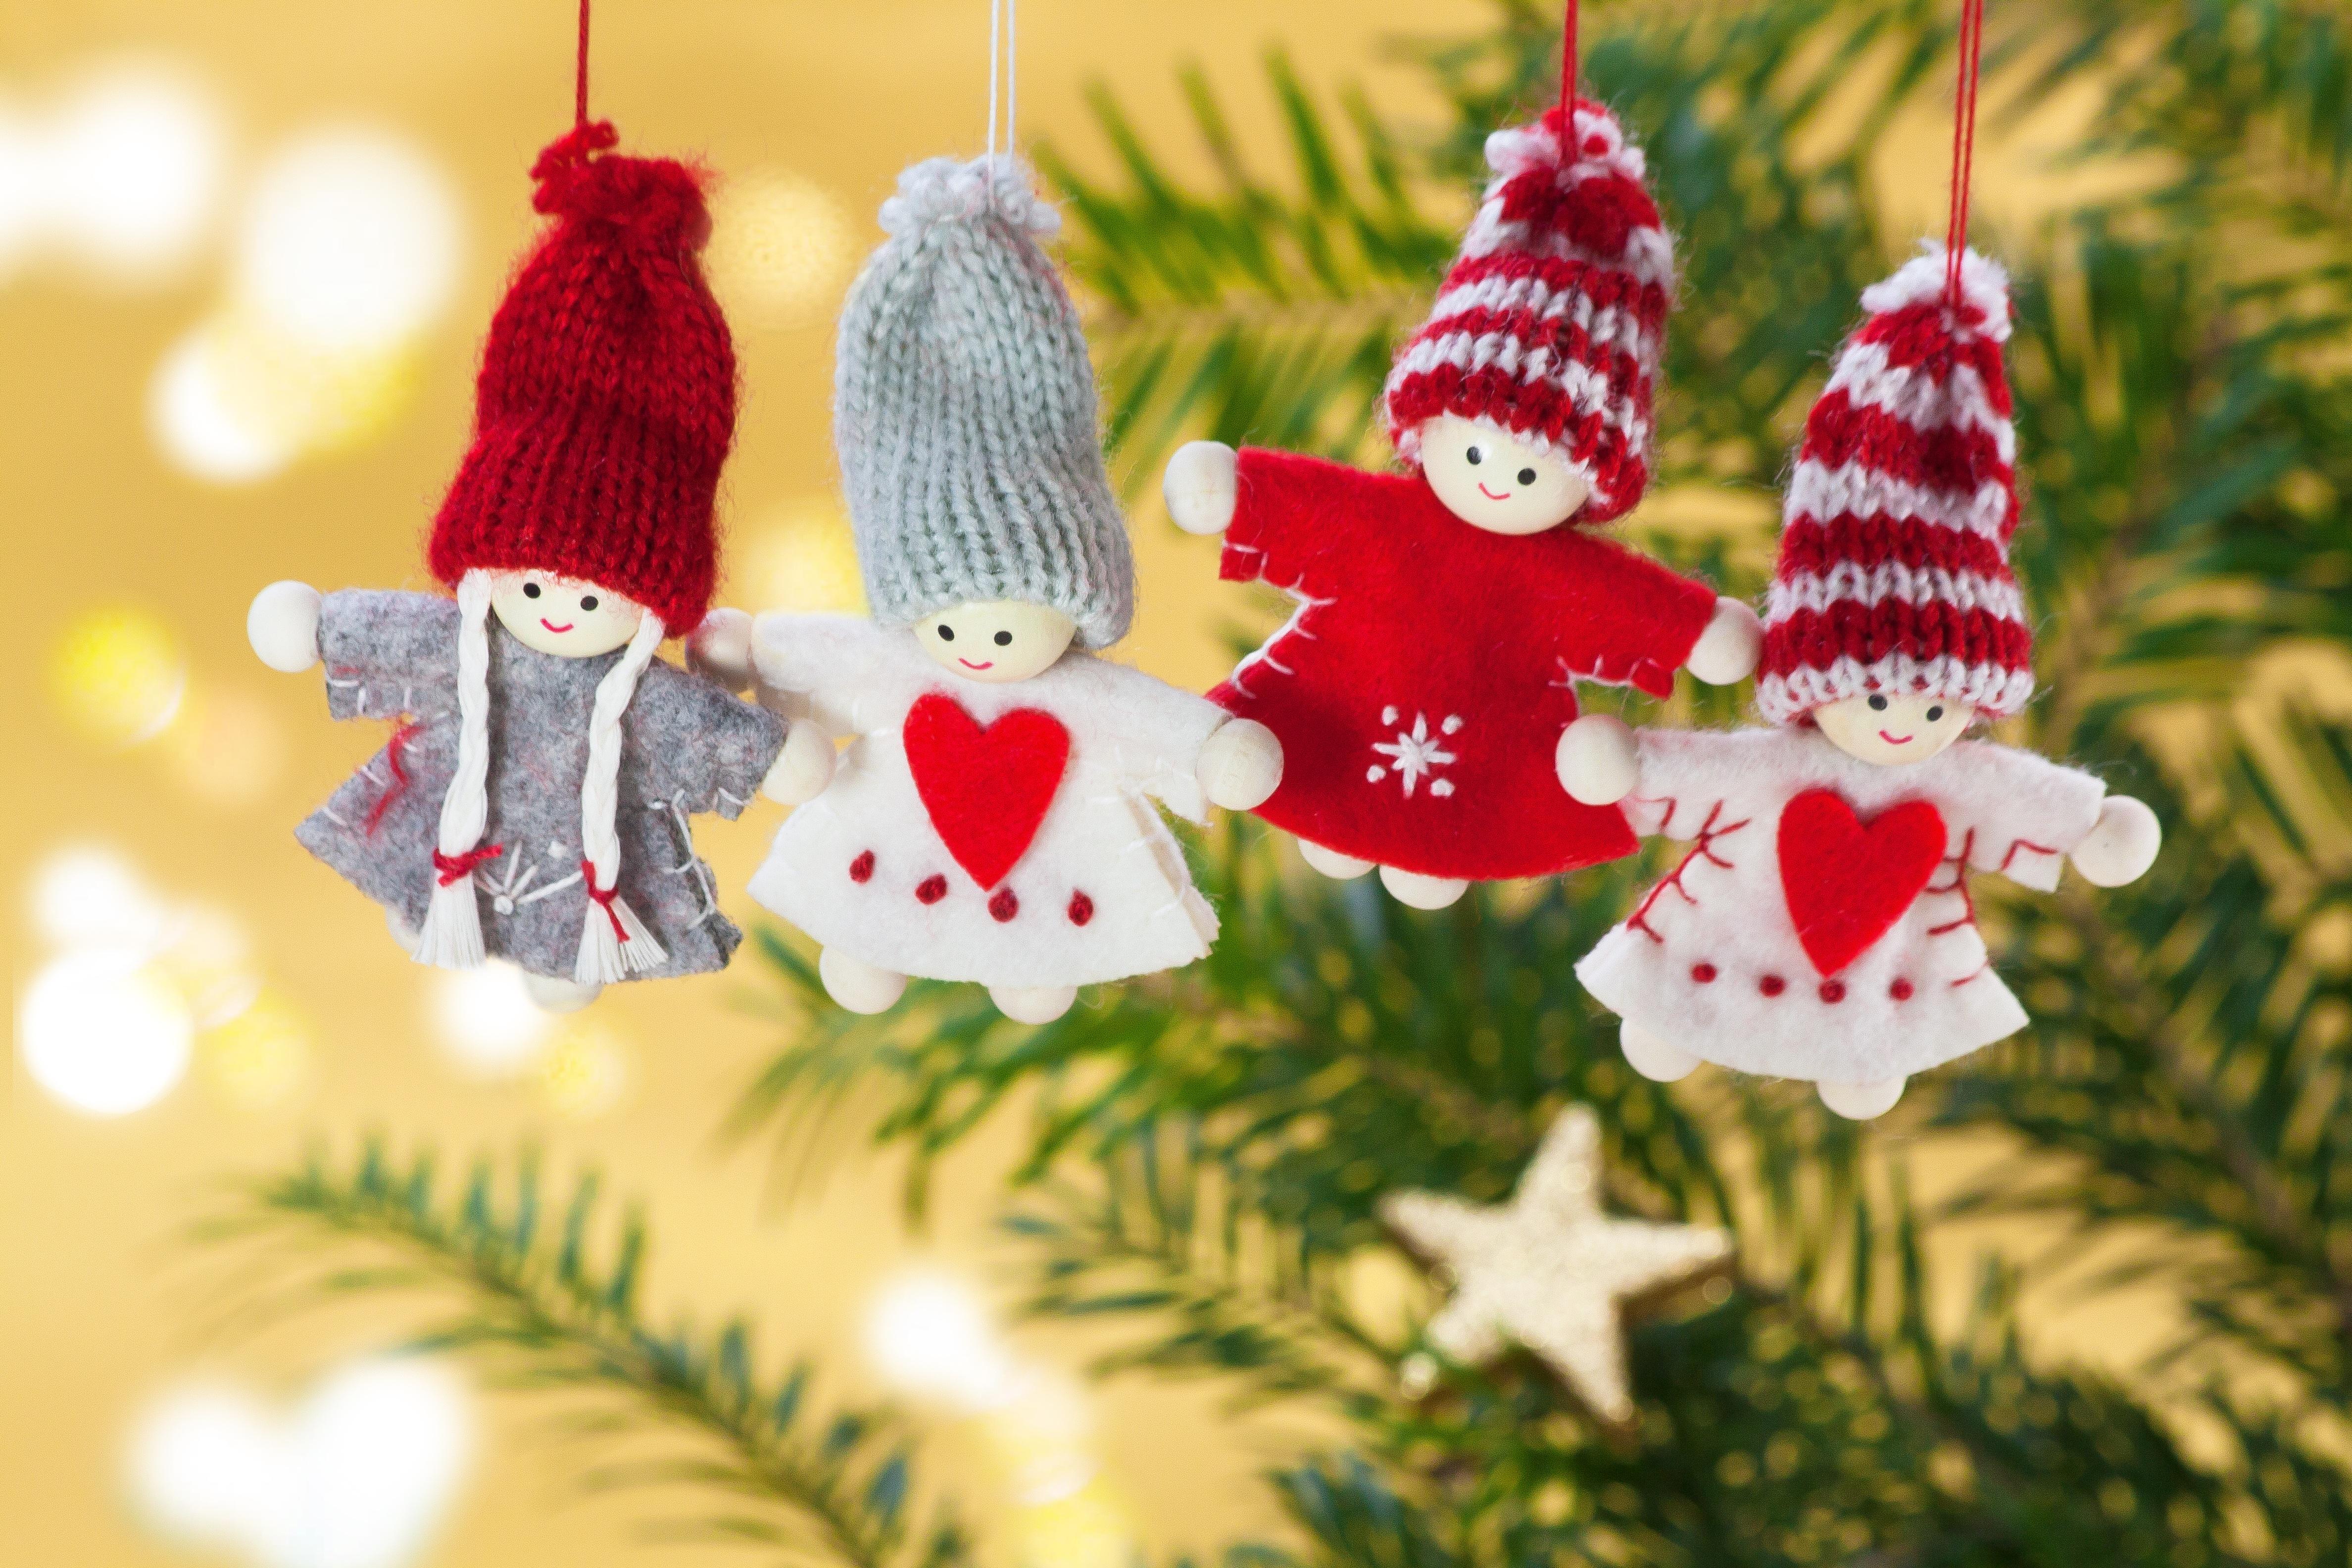 Free Images : bokeh, heart, holiday, fir, decor, christmas tree ...